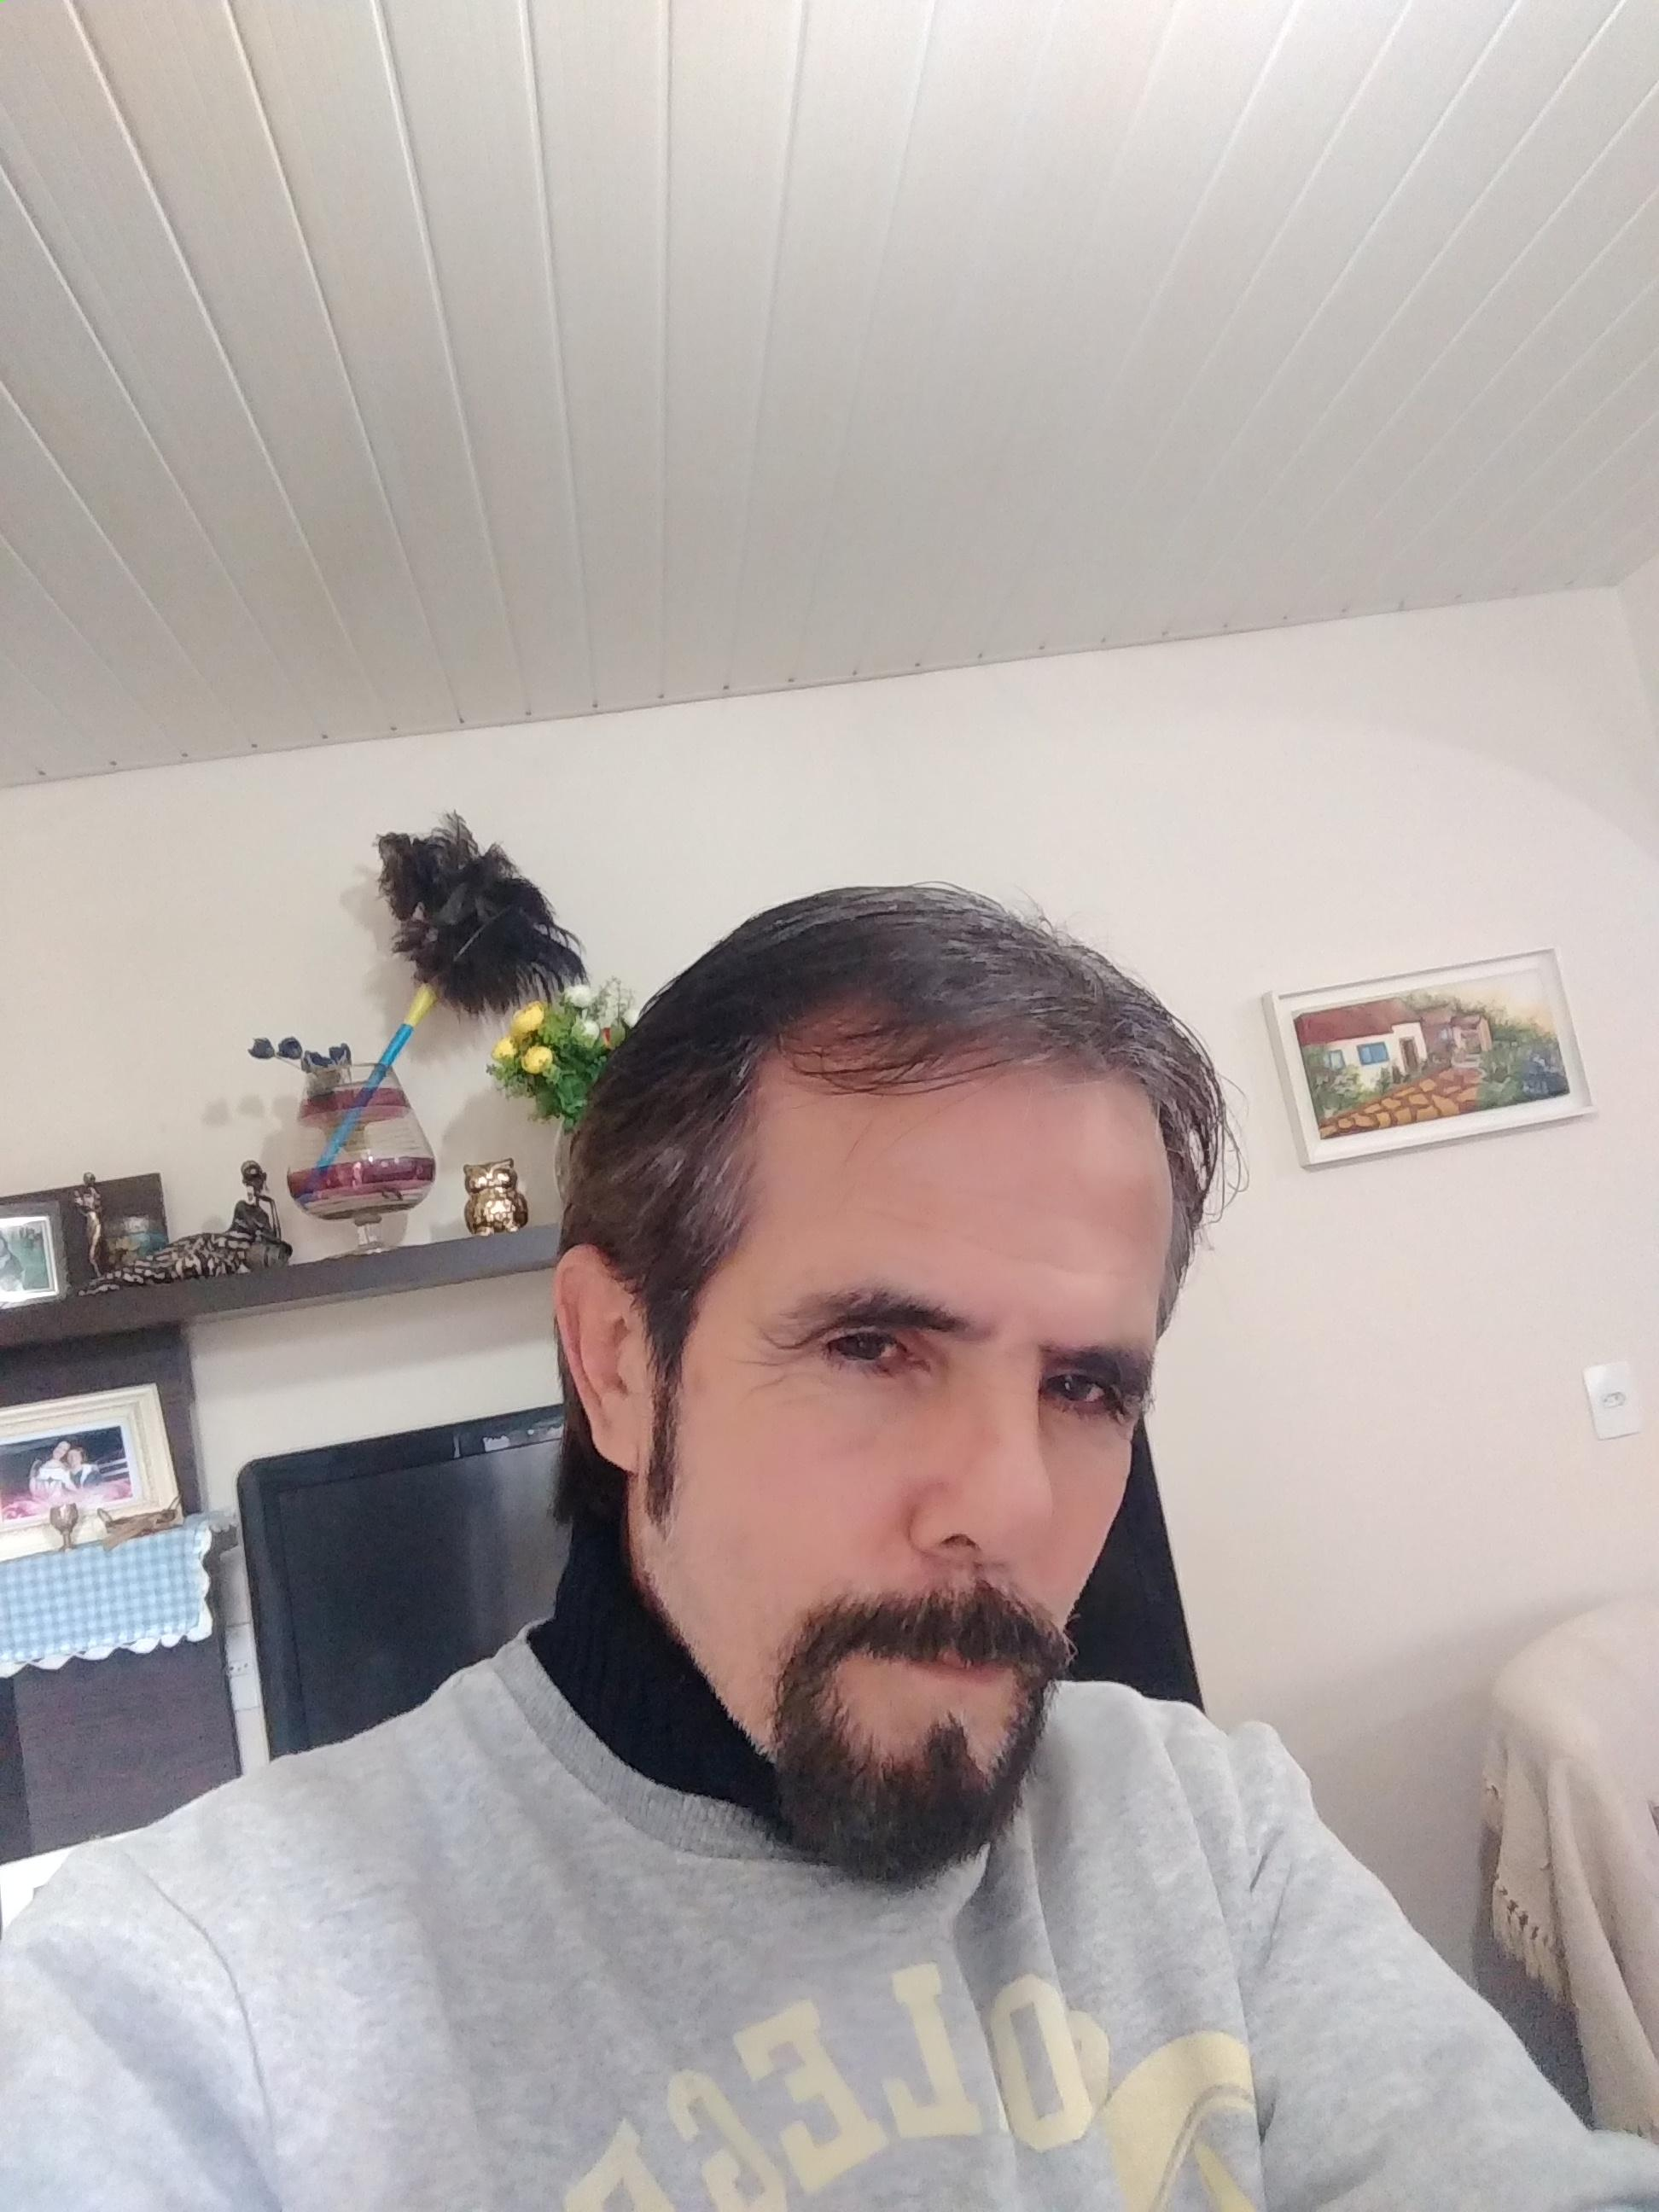 Ricardolobosc1?s=xgcandrszsp5qb7+jbtd7y5fw6o6mdwljbm54icsmlq=